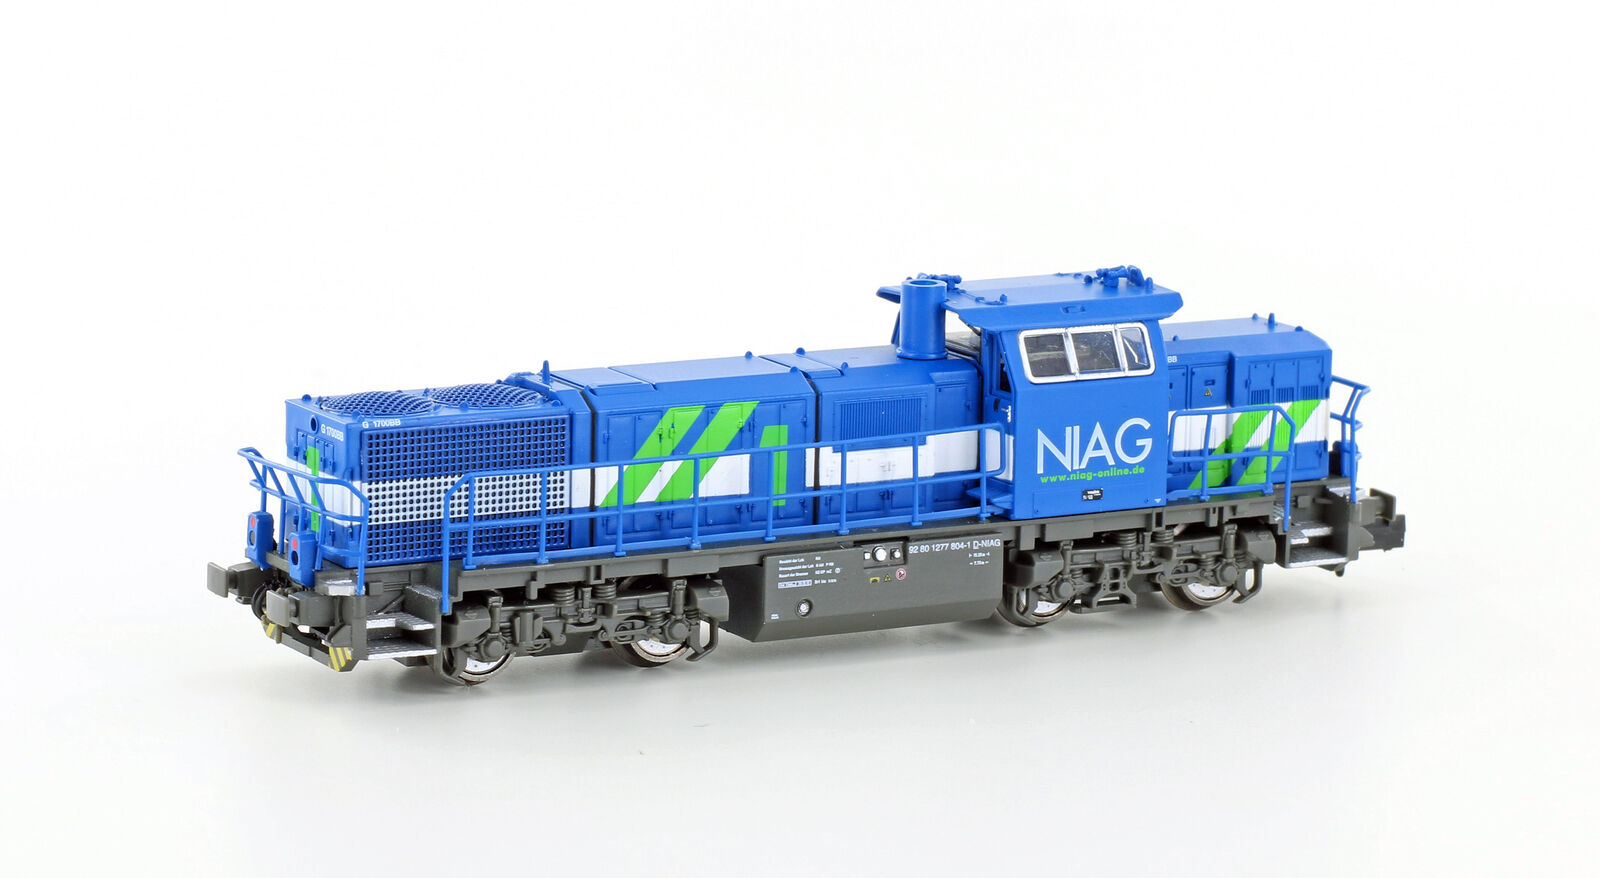 Hobbytrain 2931 Locomotora Diésel Escala N G1700